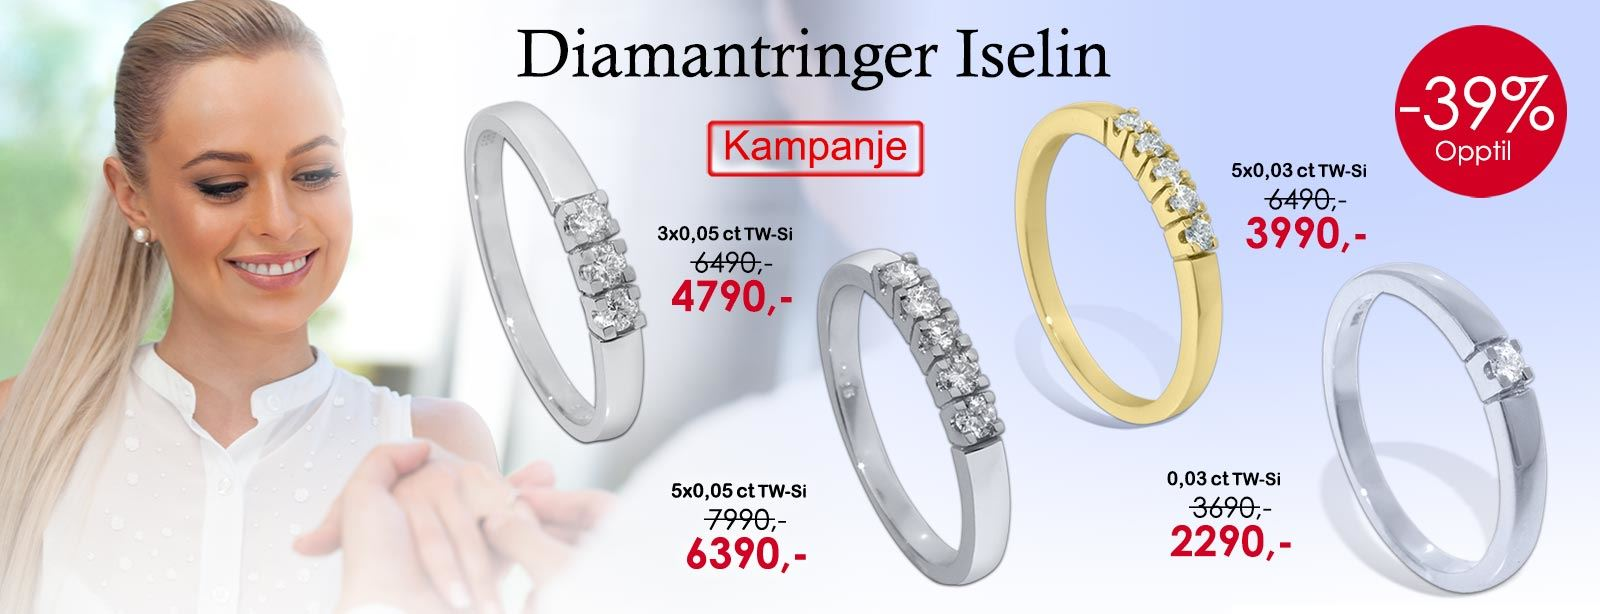 diamantserie iselin